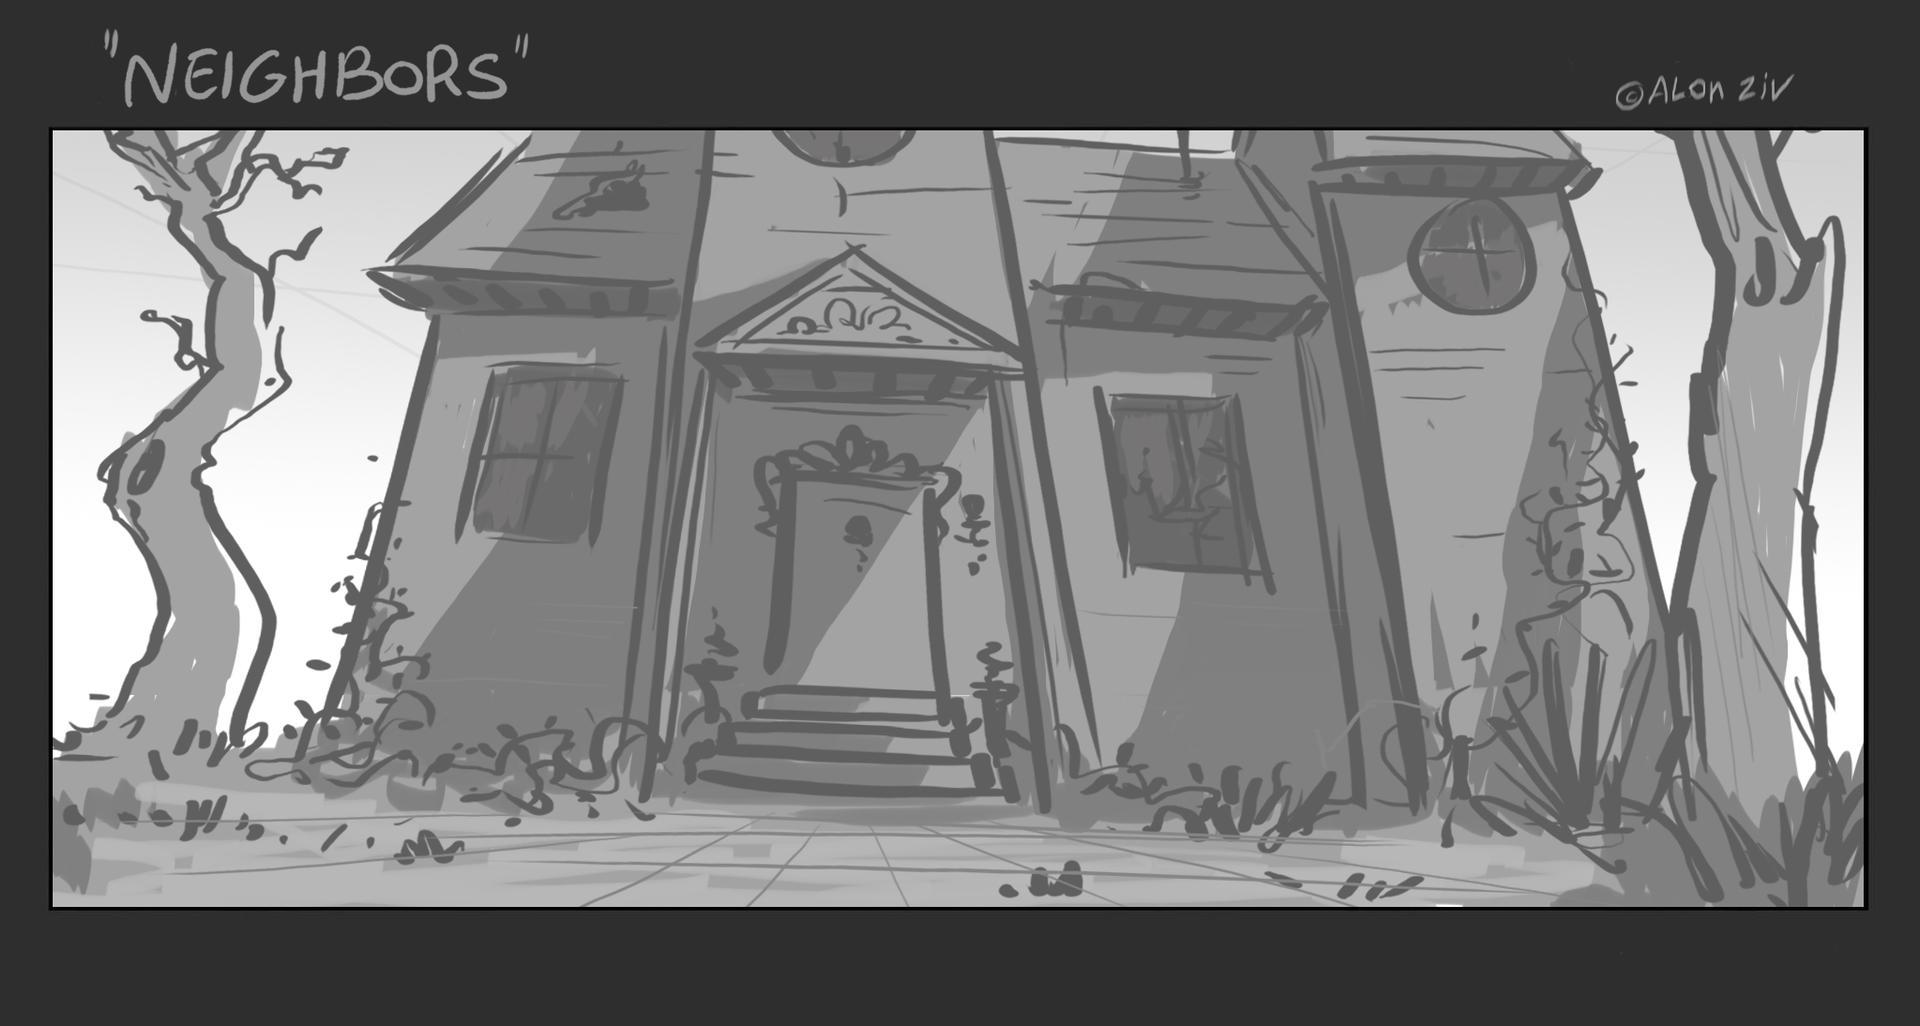 Neighbors09.jpg